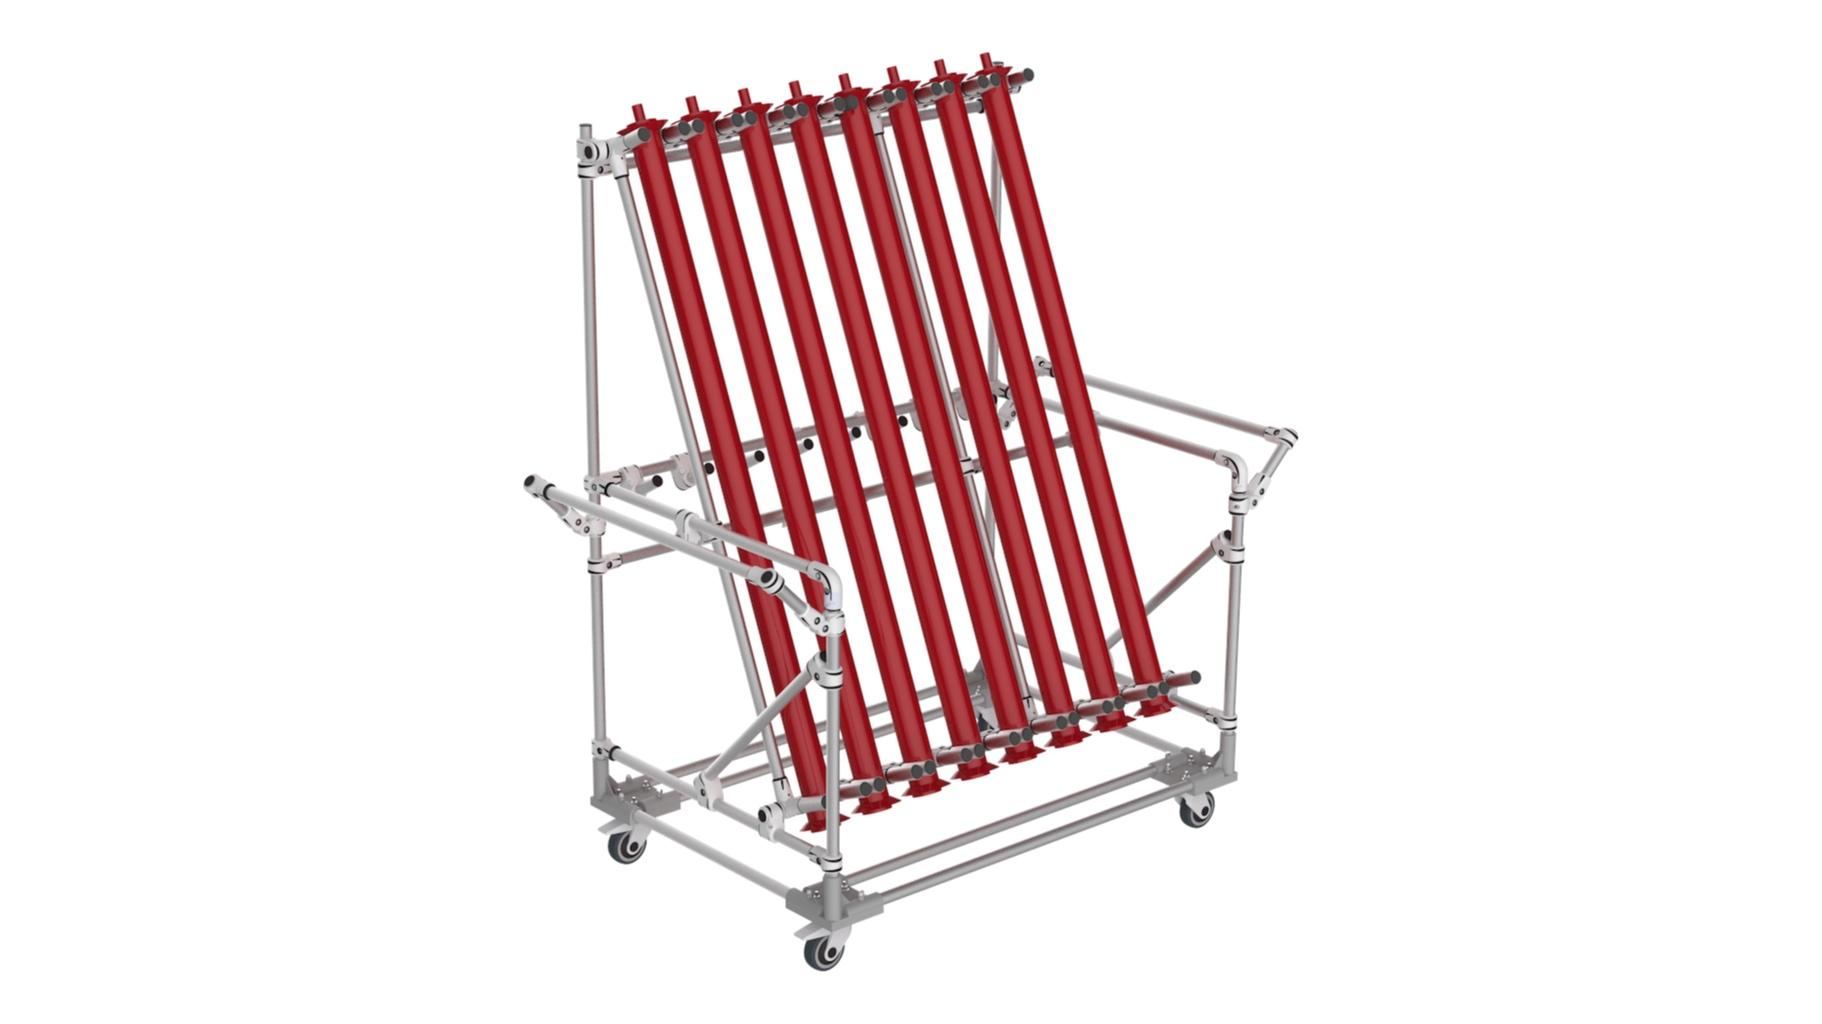 Aerospace - Storage rack for light fixtures.